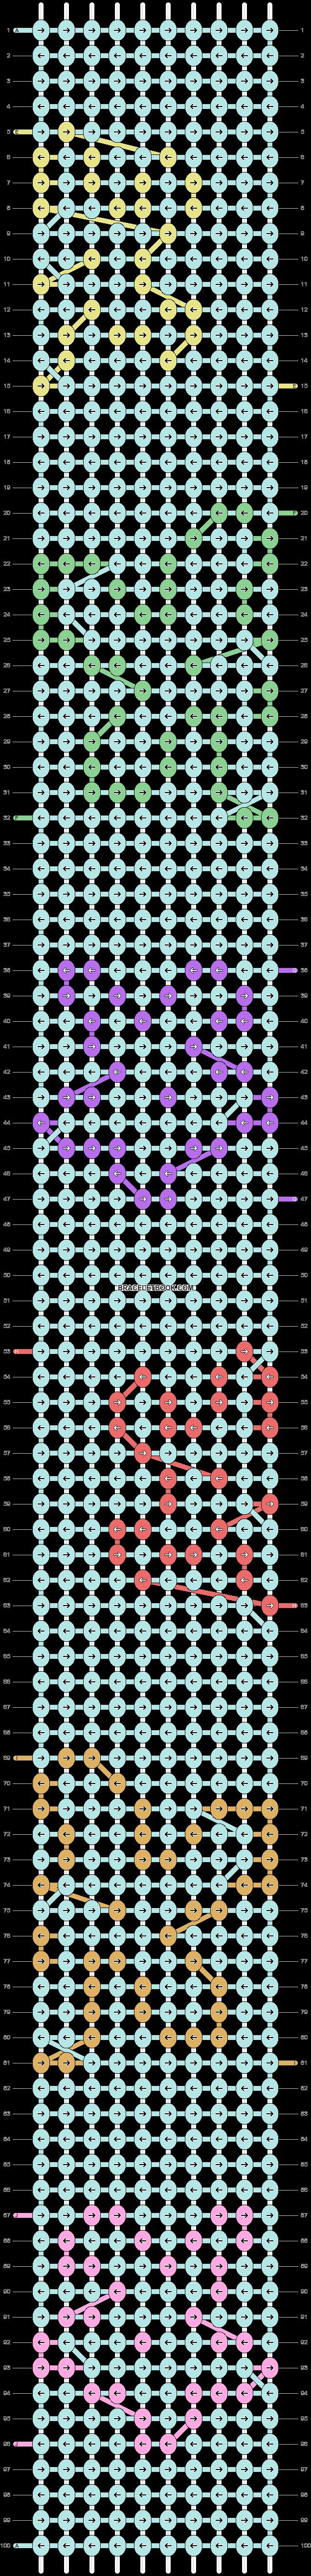 Alpha pattern #51202 pattern